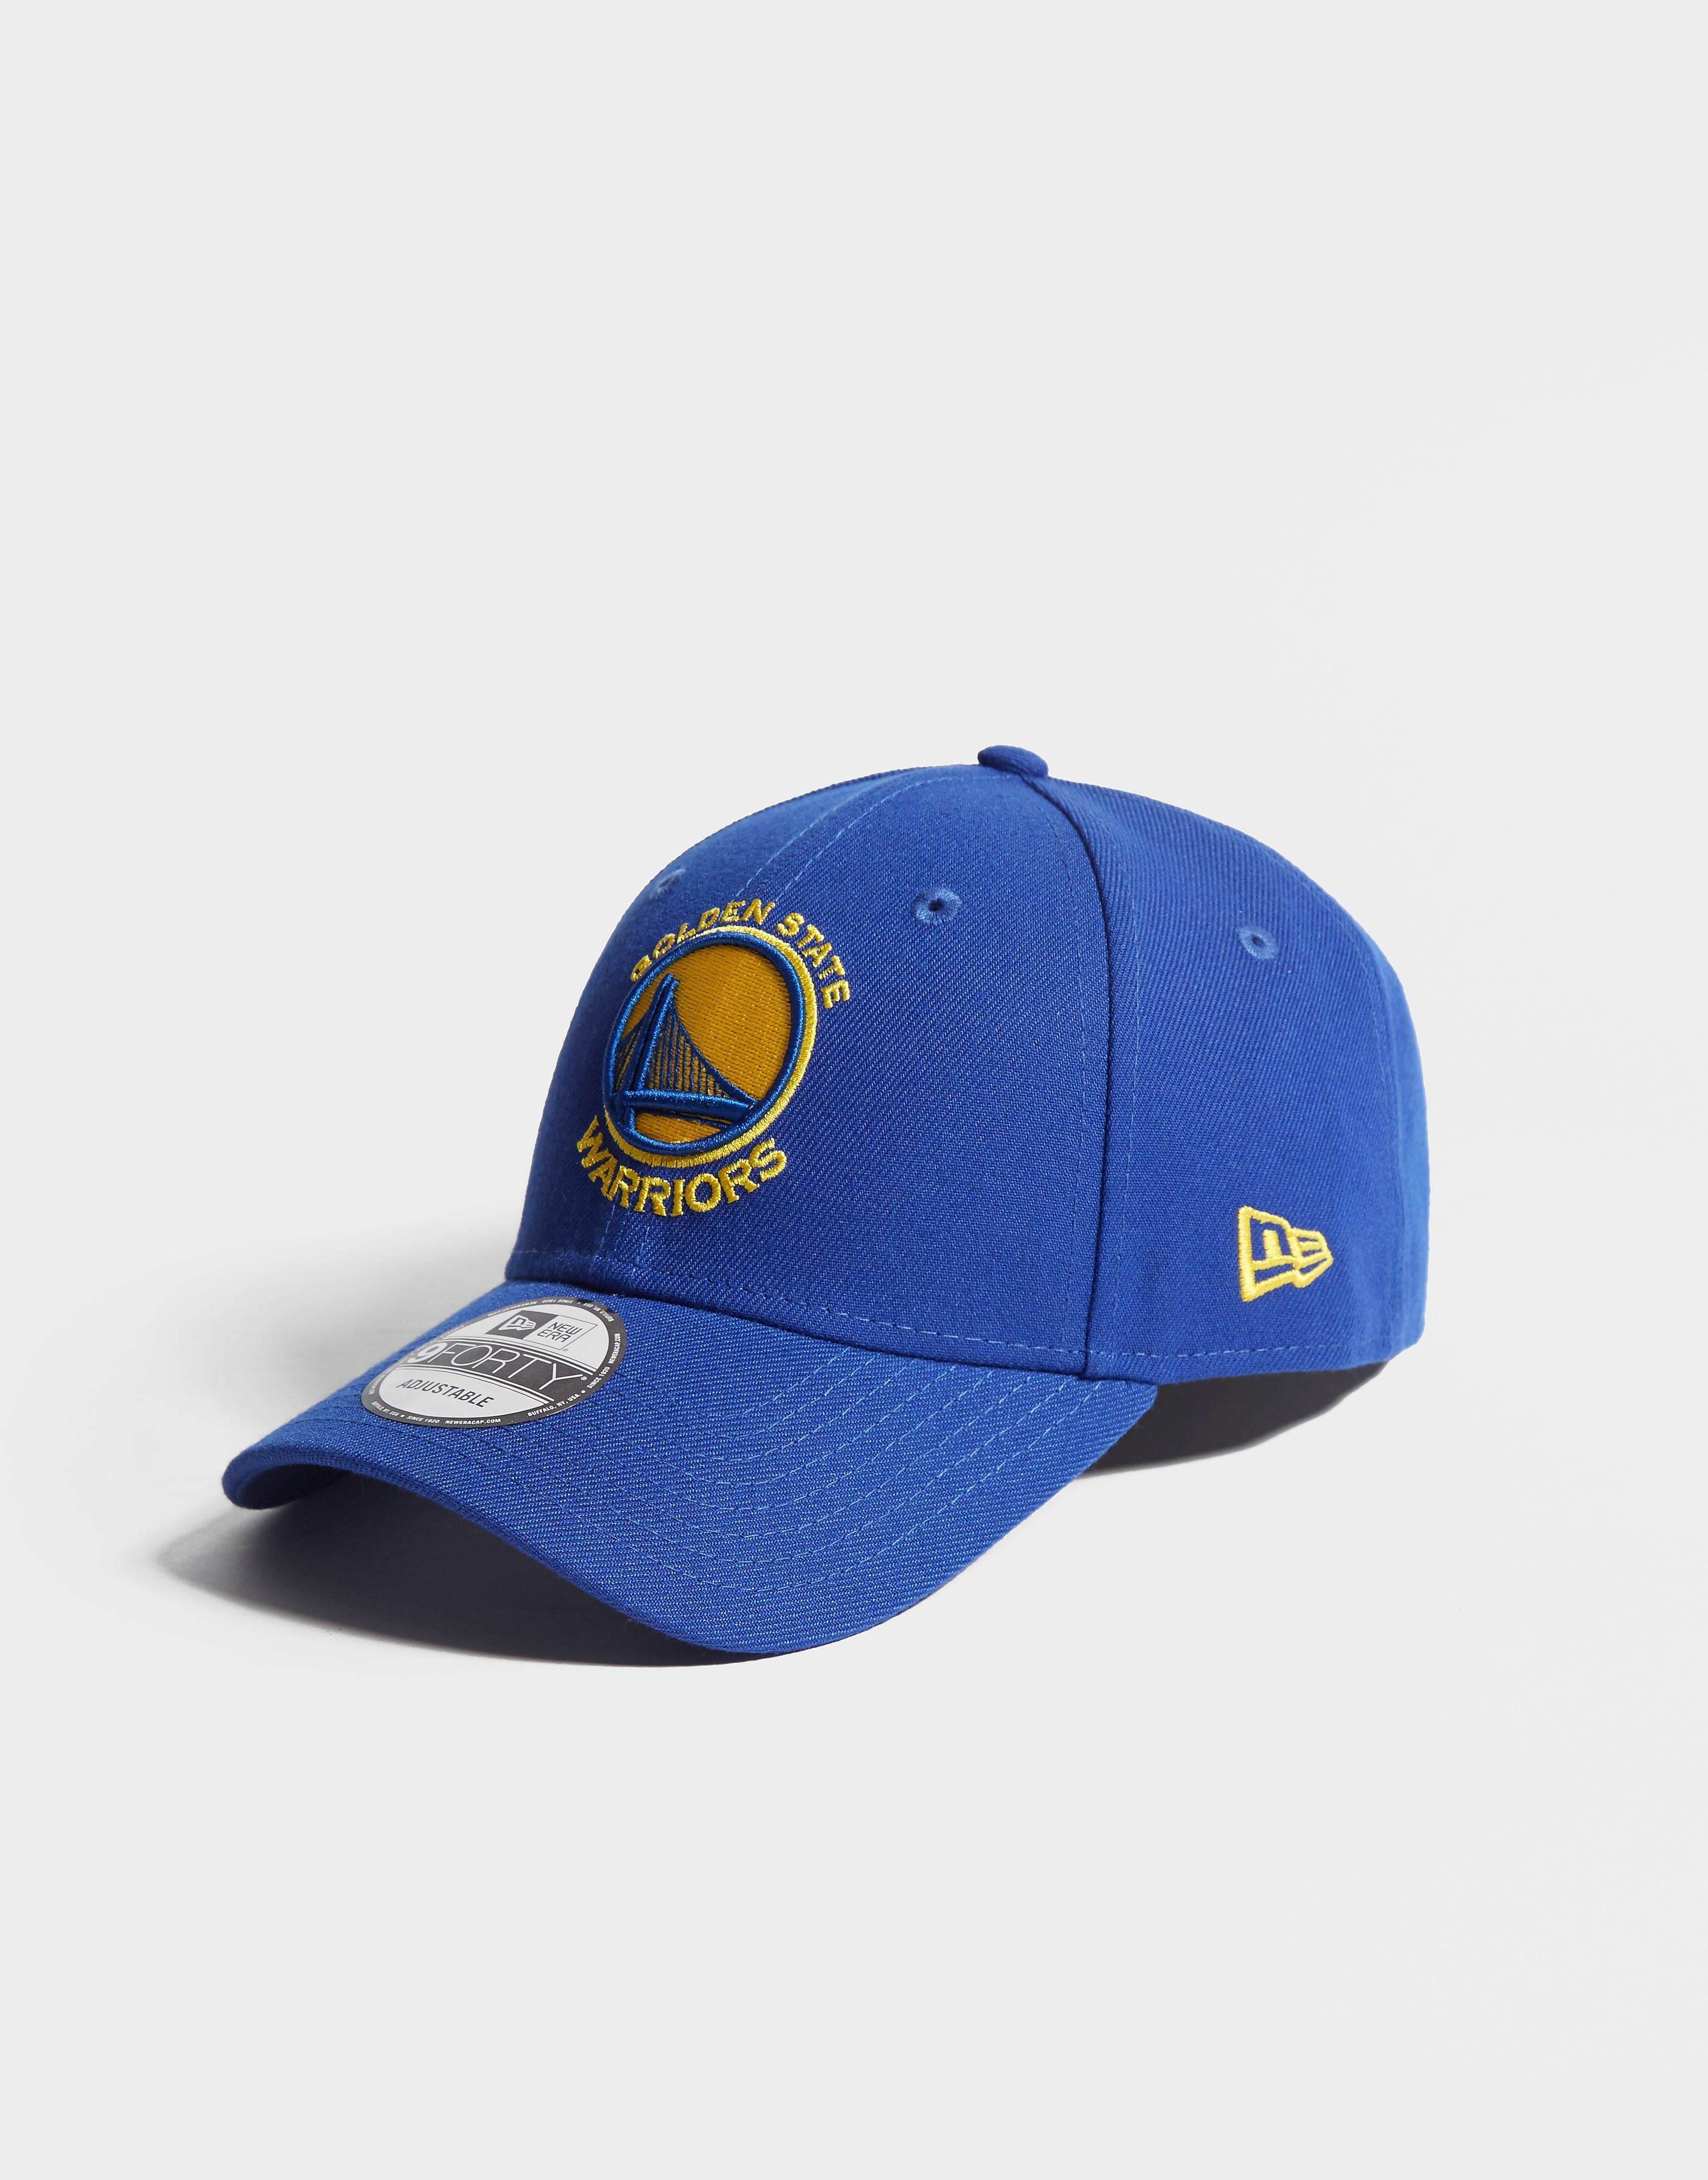 New Era NBA Golden State Warriors 9FORTY Cap